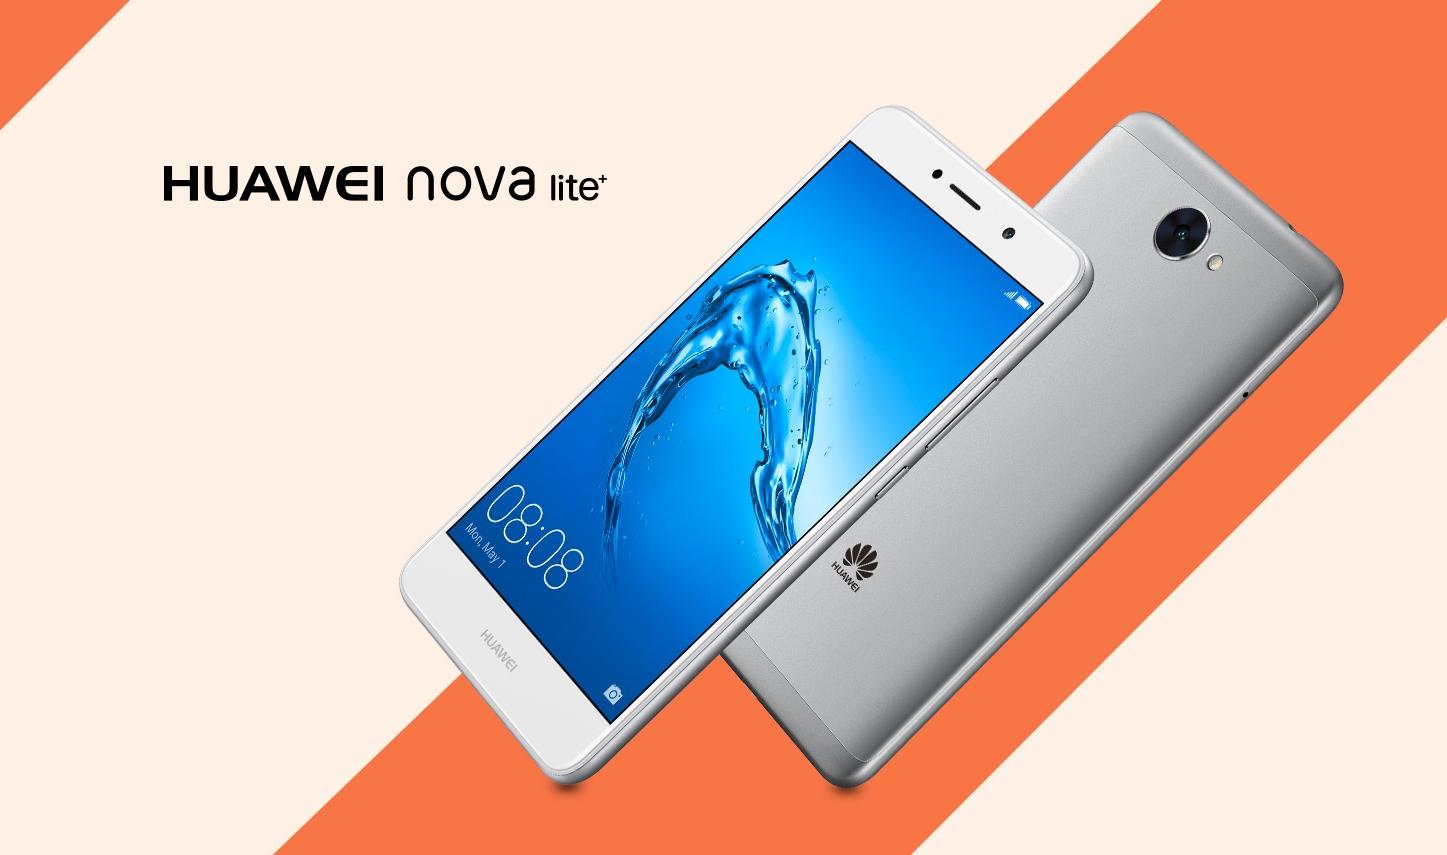 Huawei complexifie sa gamme avec le Nova Lite+ et le Nova Young